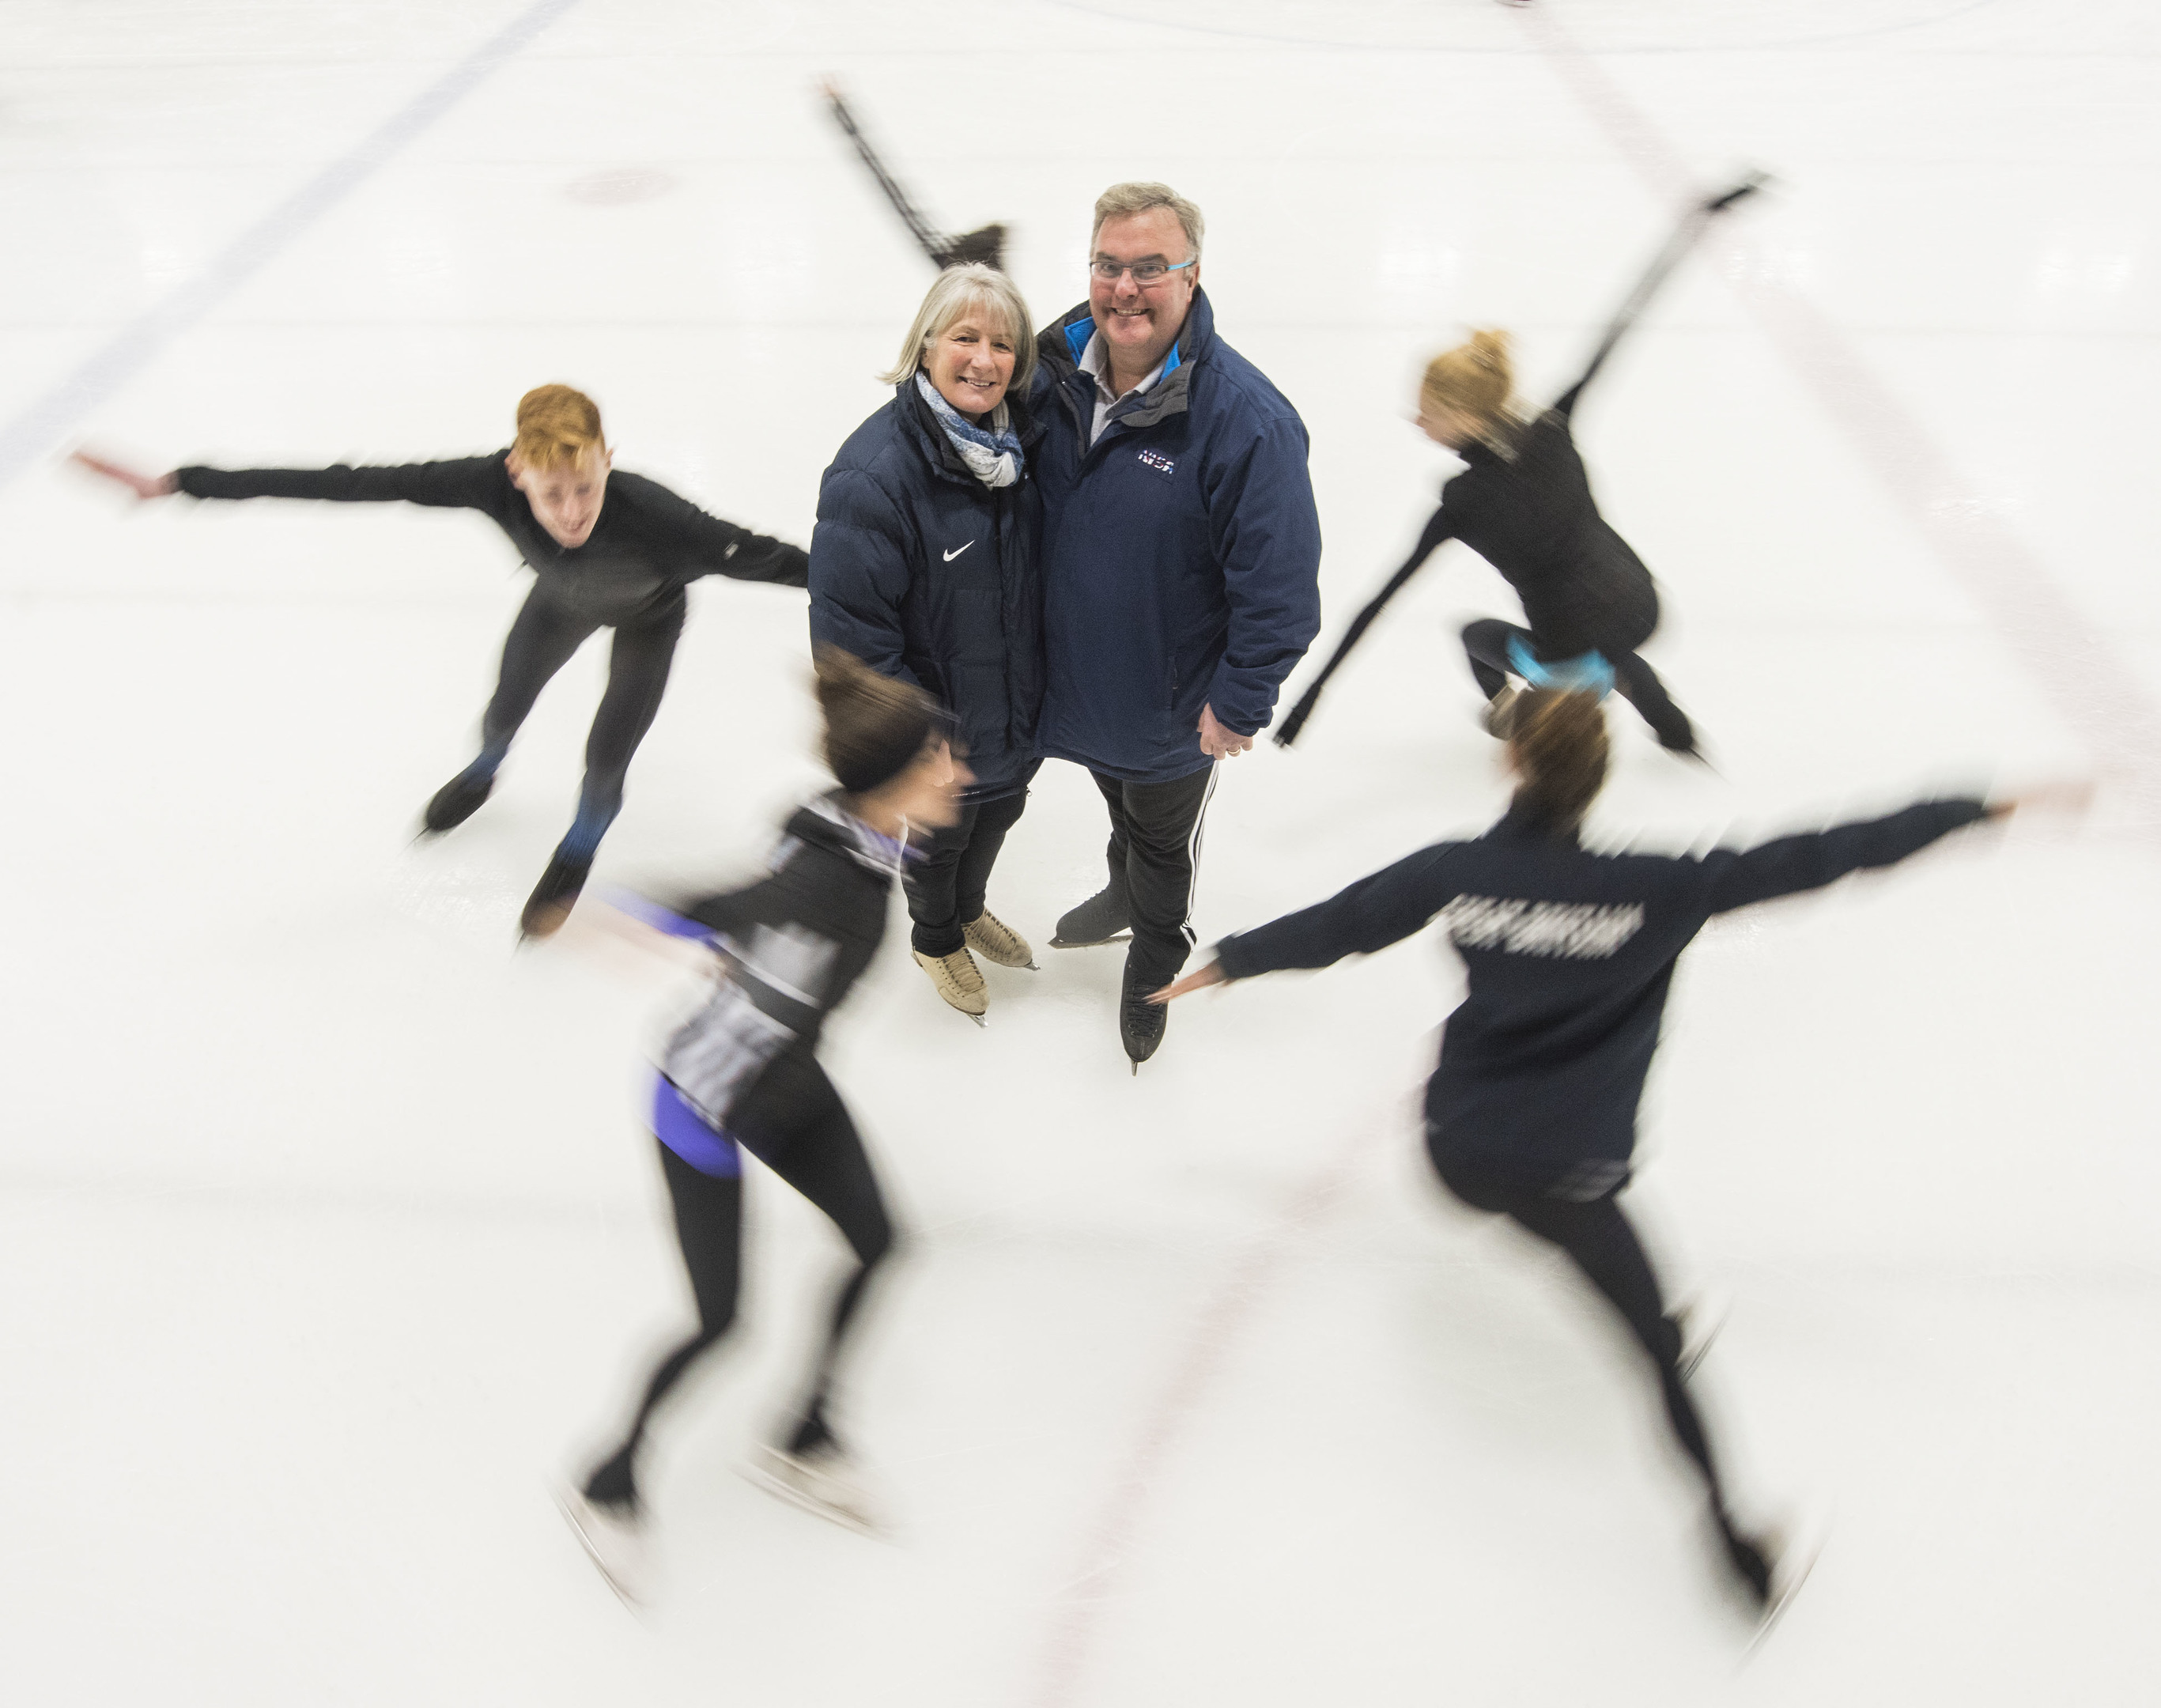 Ice skating coaches Simon and Debi Briggs at Dundee Ice Arena (Alan Richardson/ Pix-AR.co.uk)